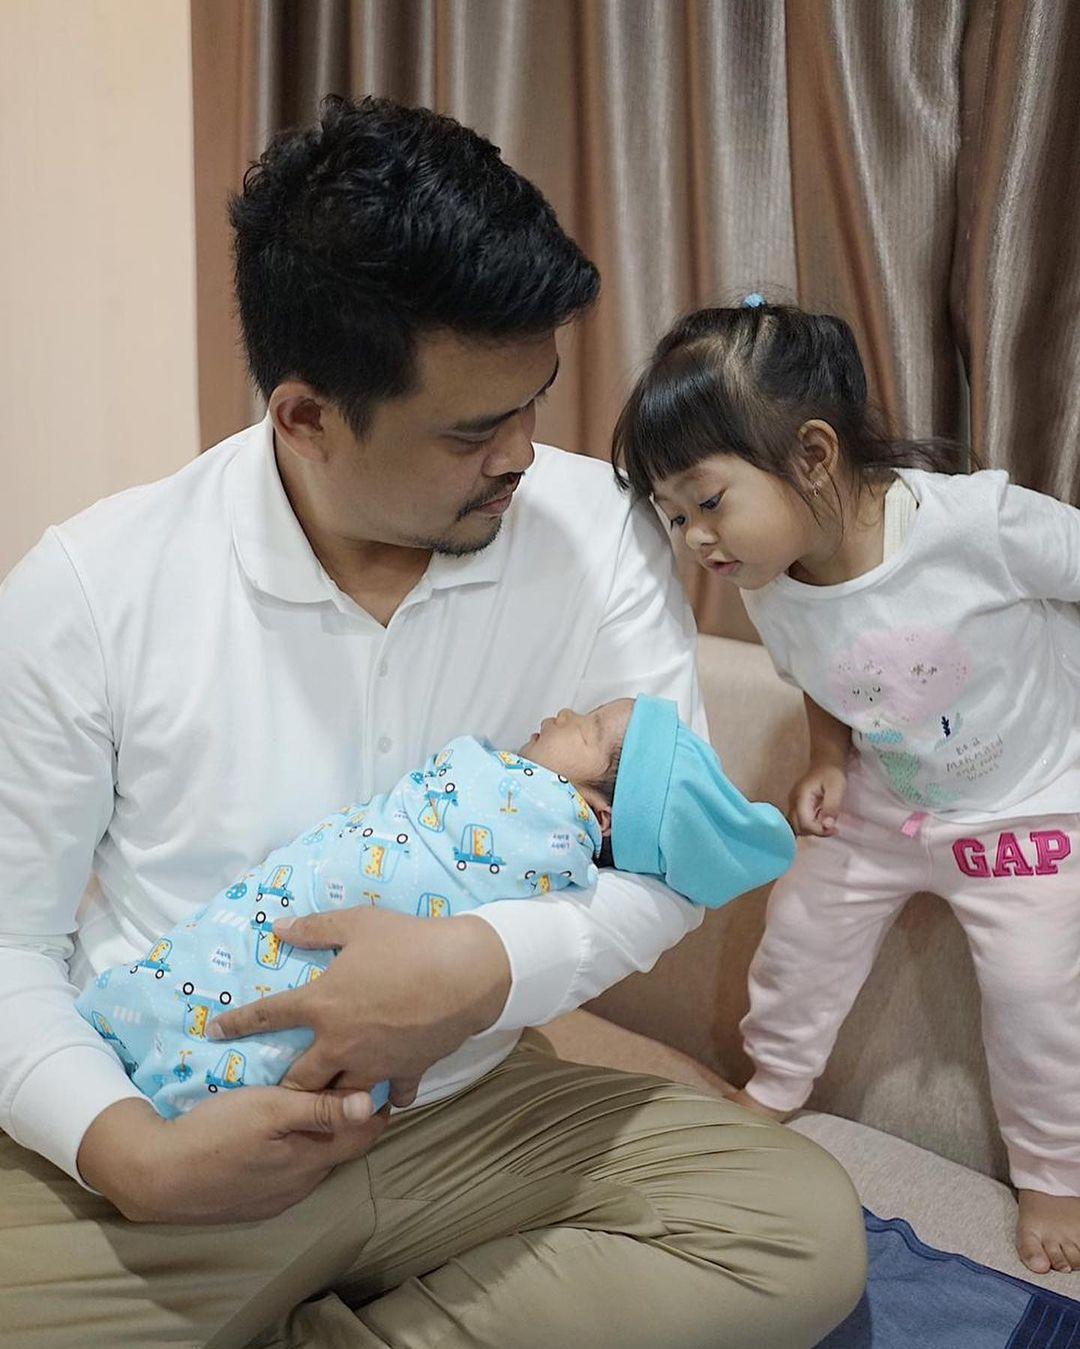 7 Potret Bobby Nasution Momong Anak, Ayah Idaman Banget - Foto 3